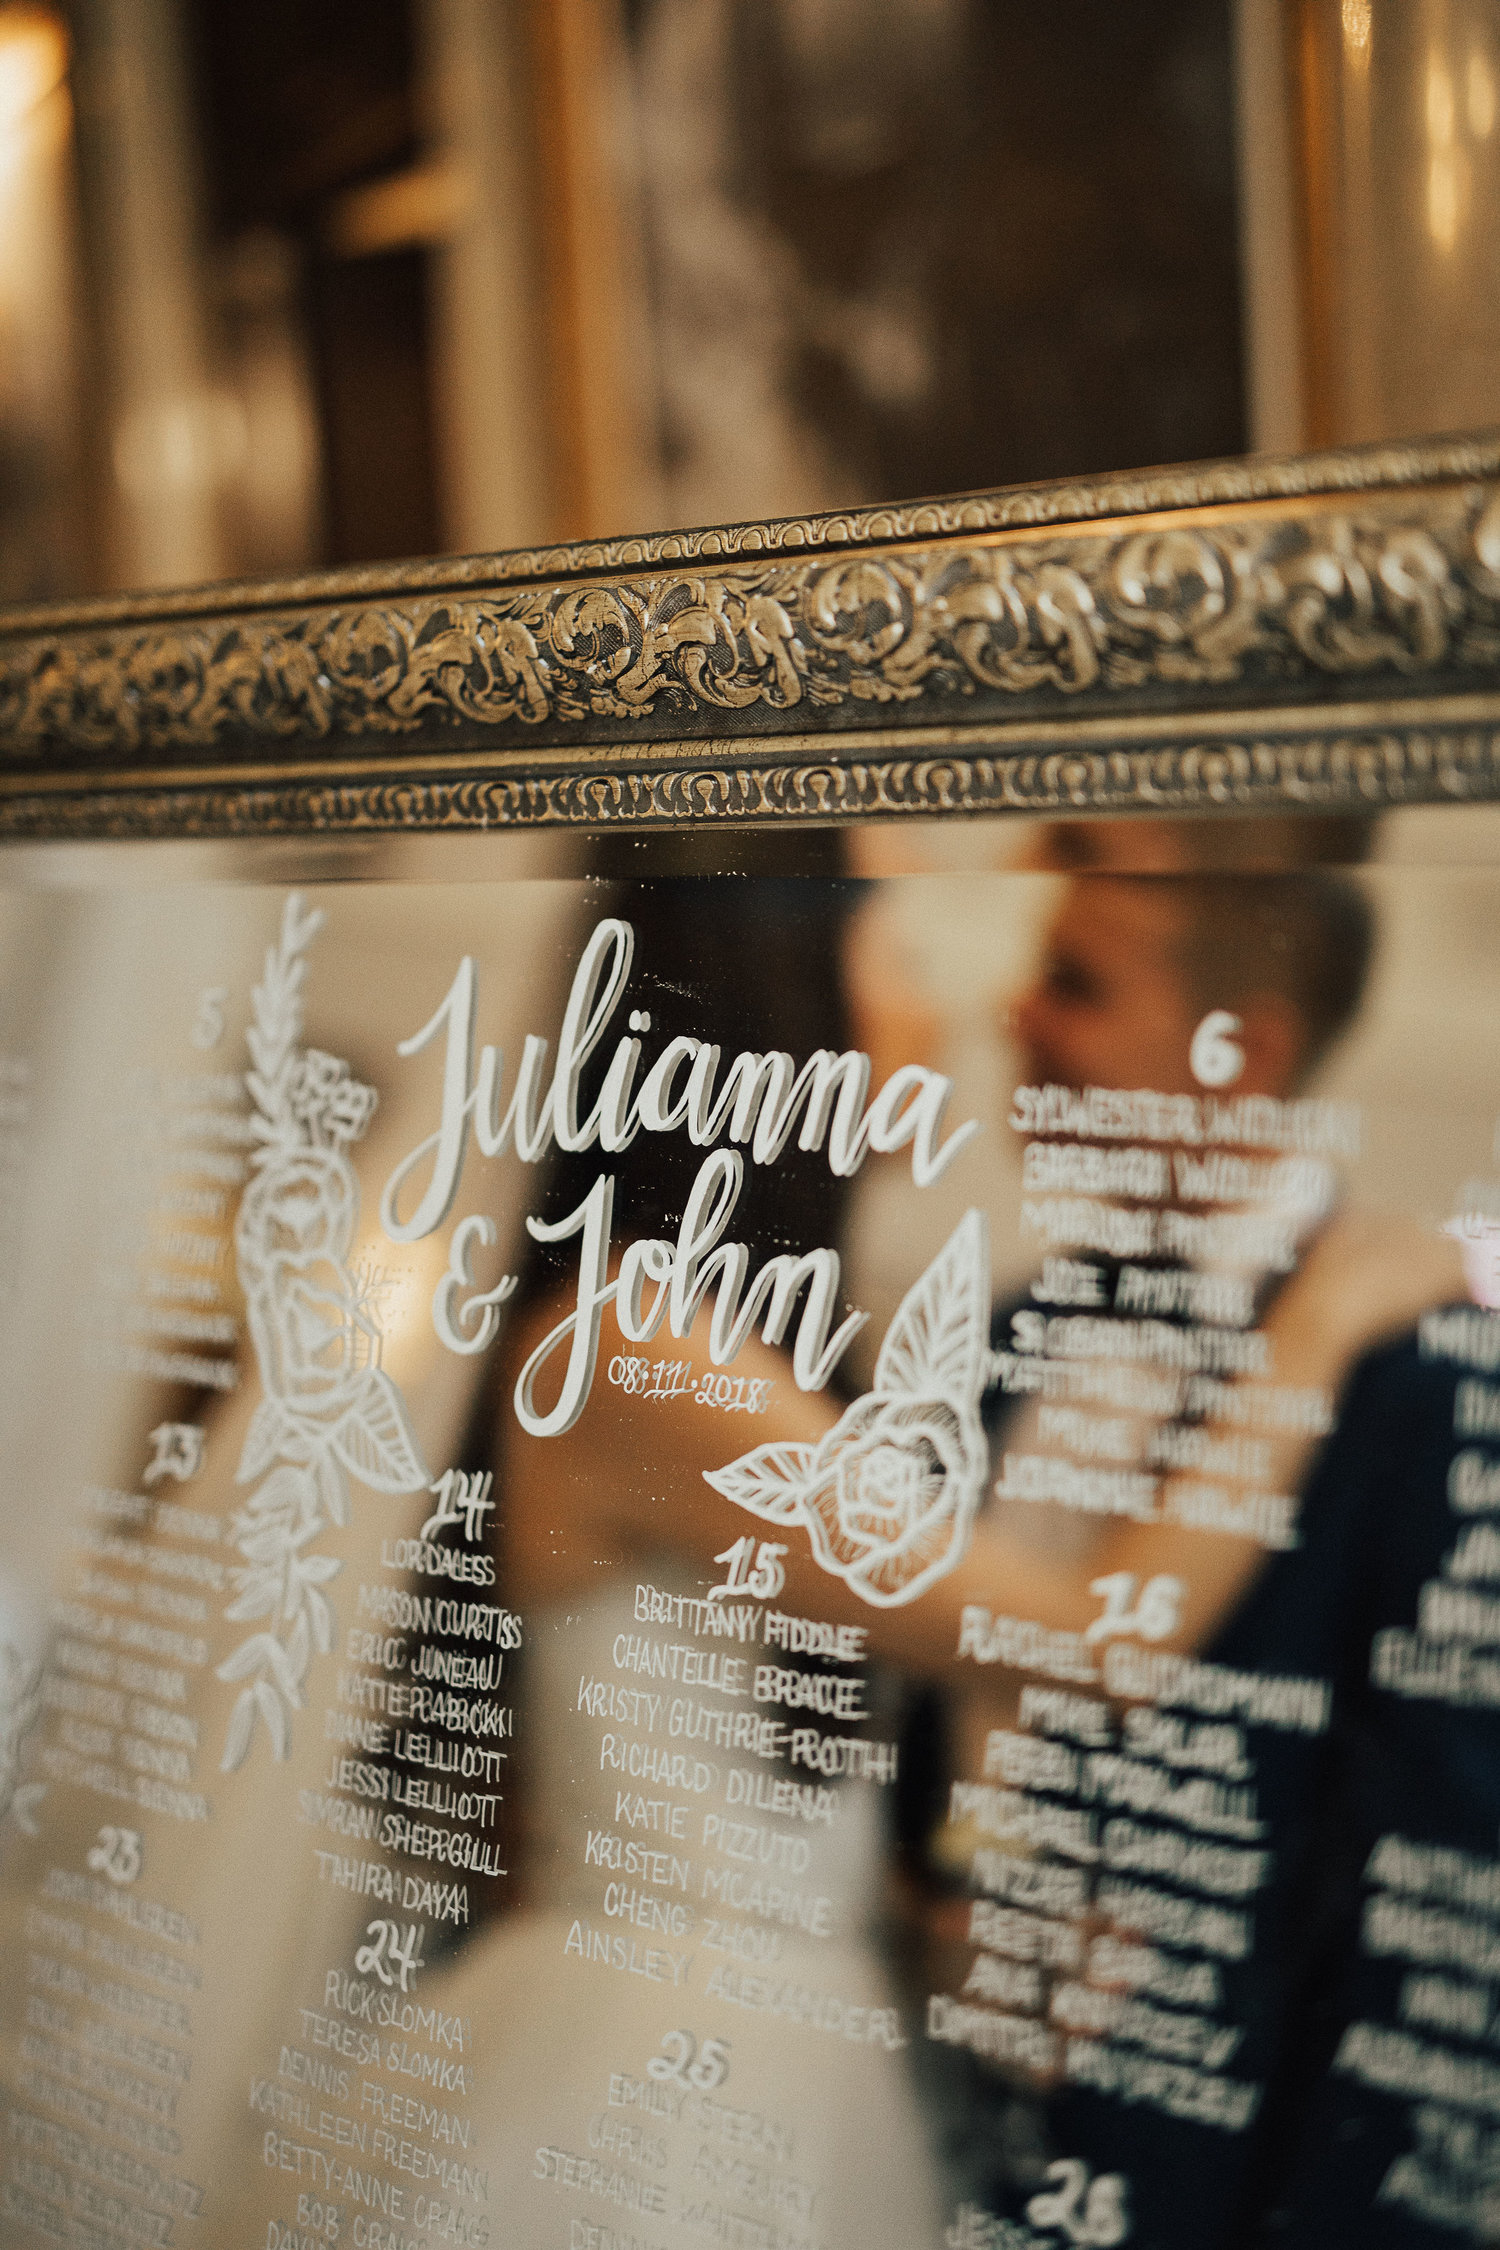 tayne-and-ashley-wedding-jules-john-nautical-studios-mirror-seating-chart-2.jpg